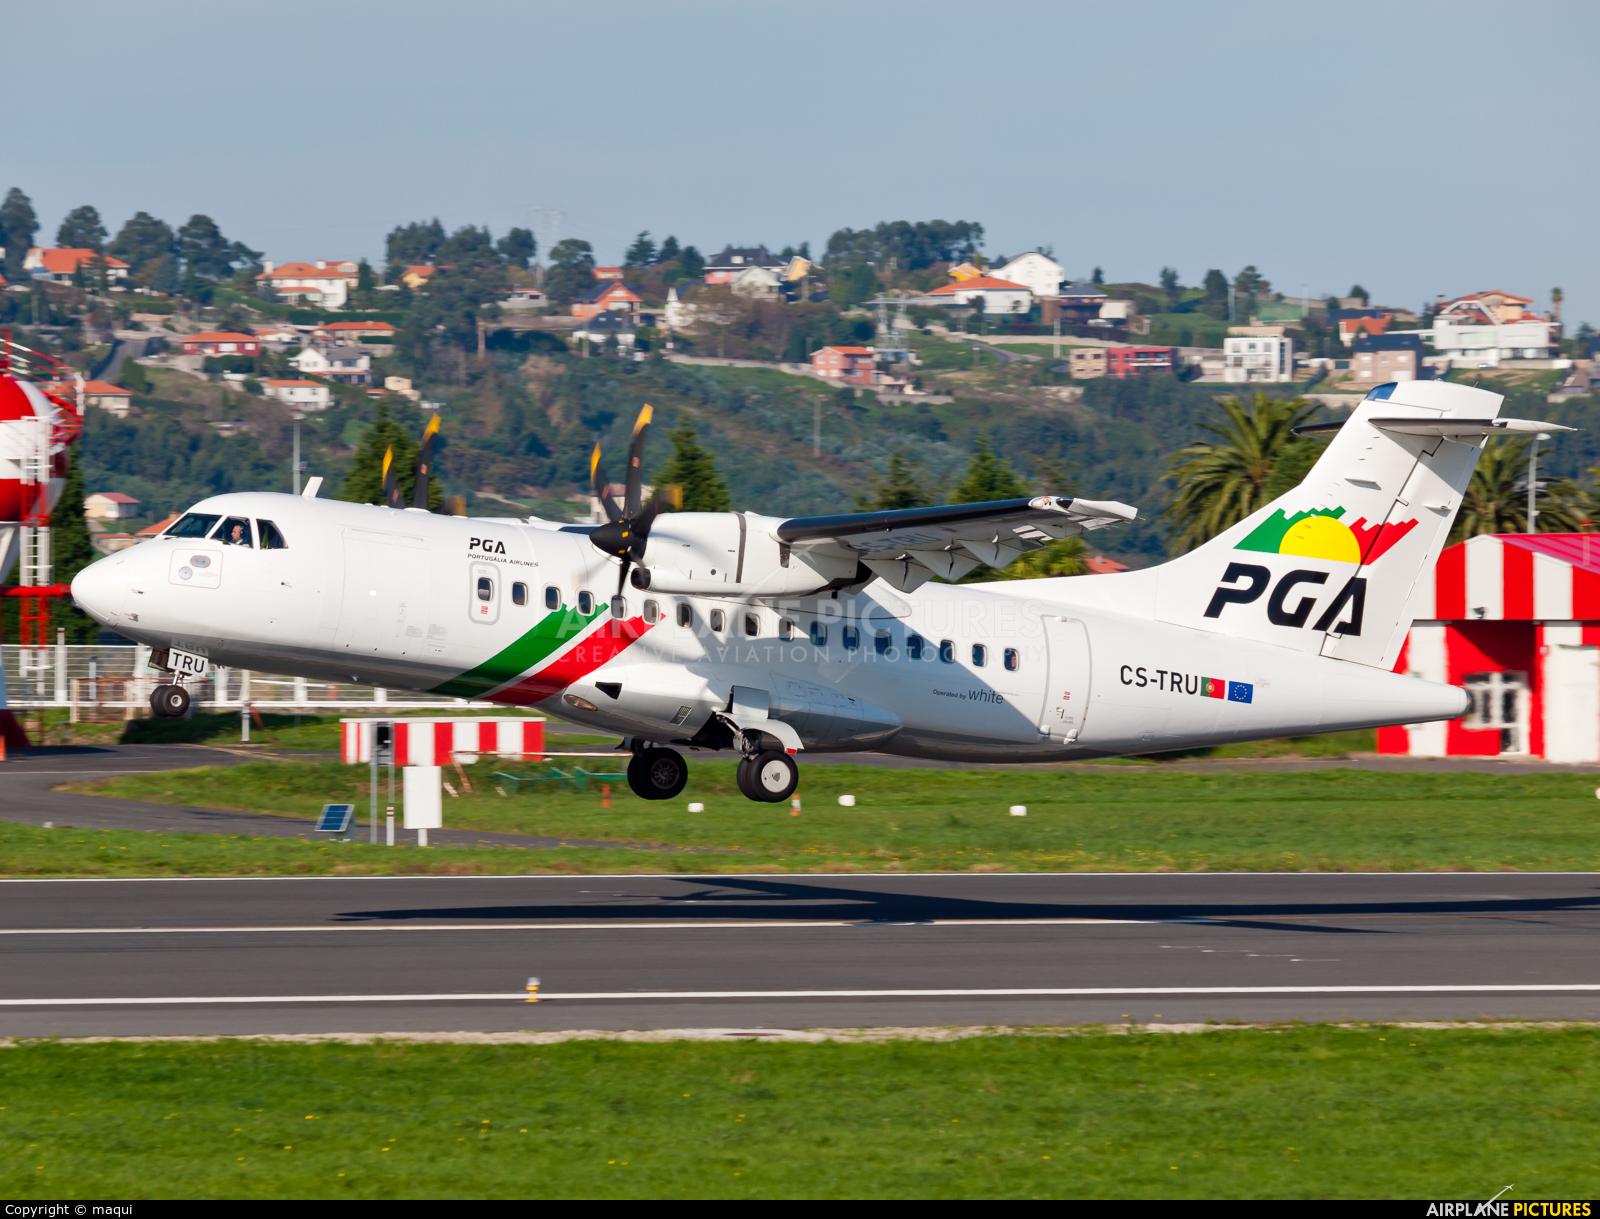 PGA Portugalia CS-TRU aircraft at La Coruña